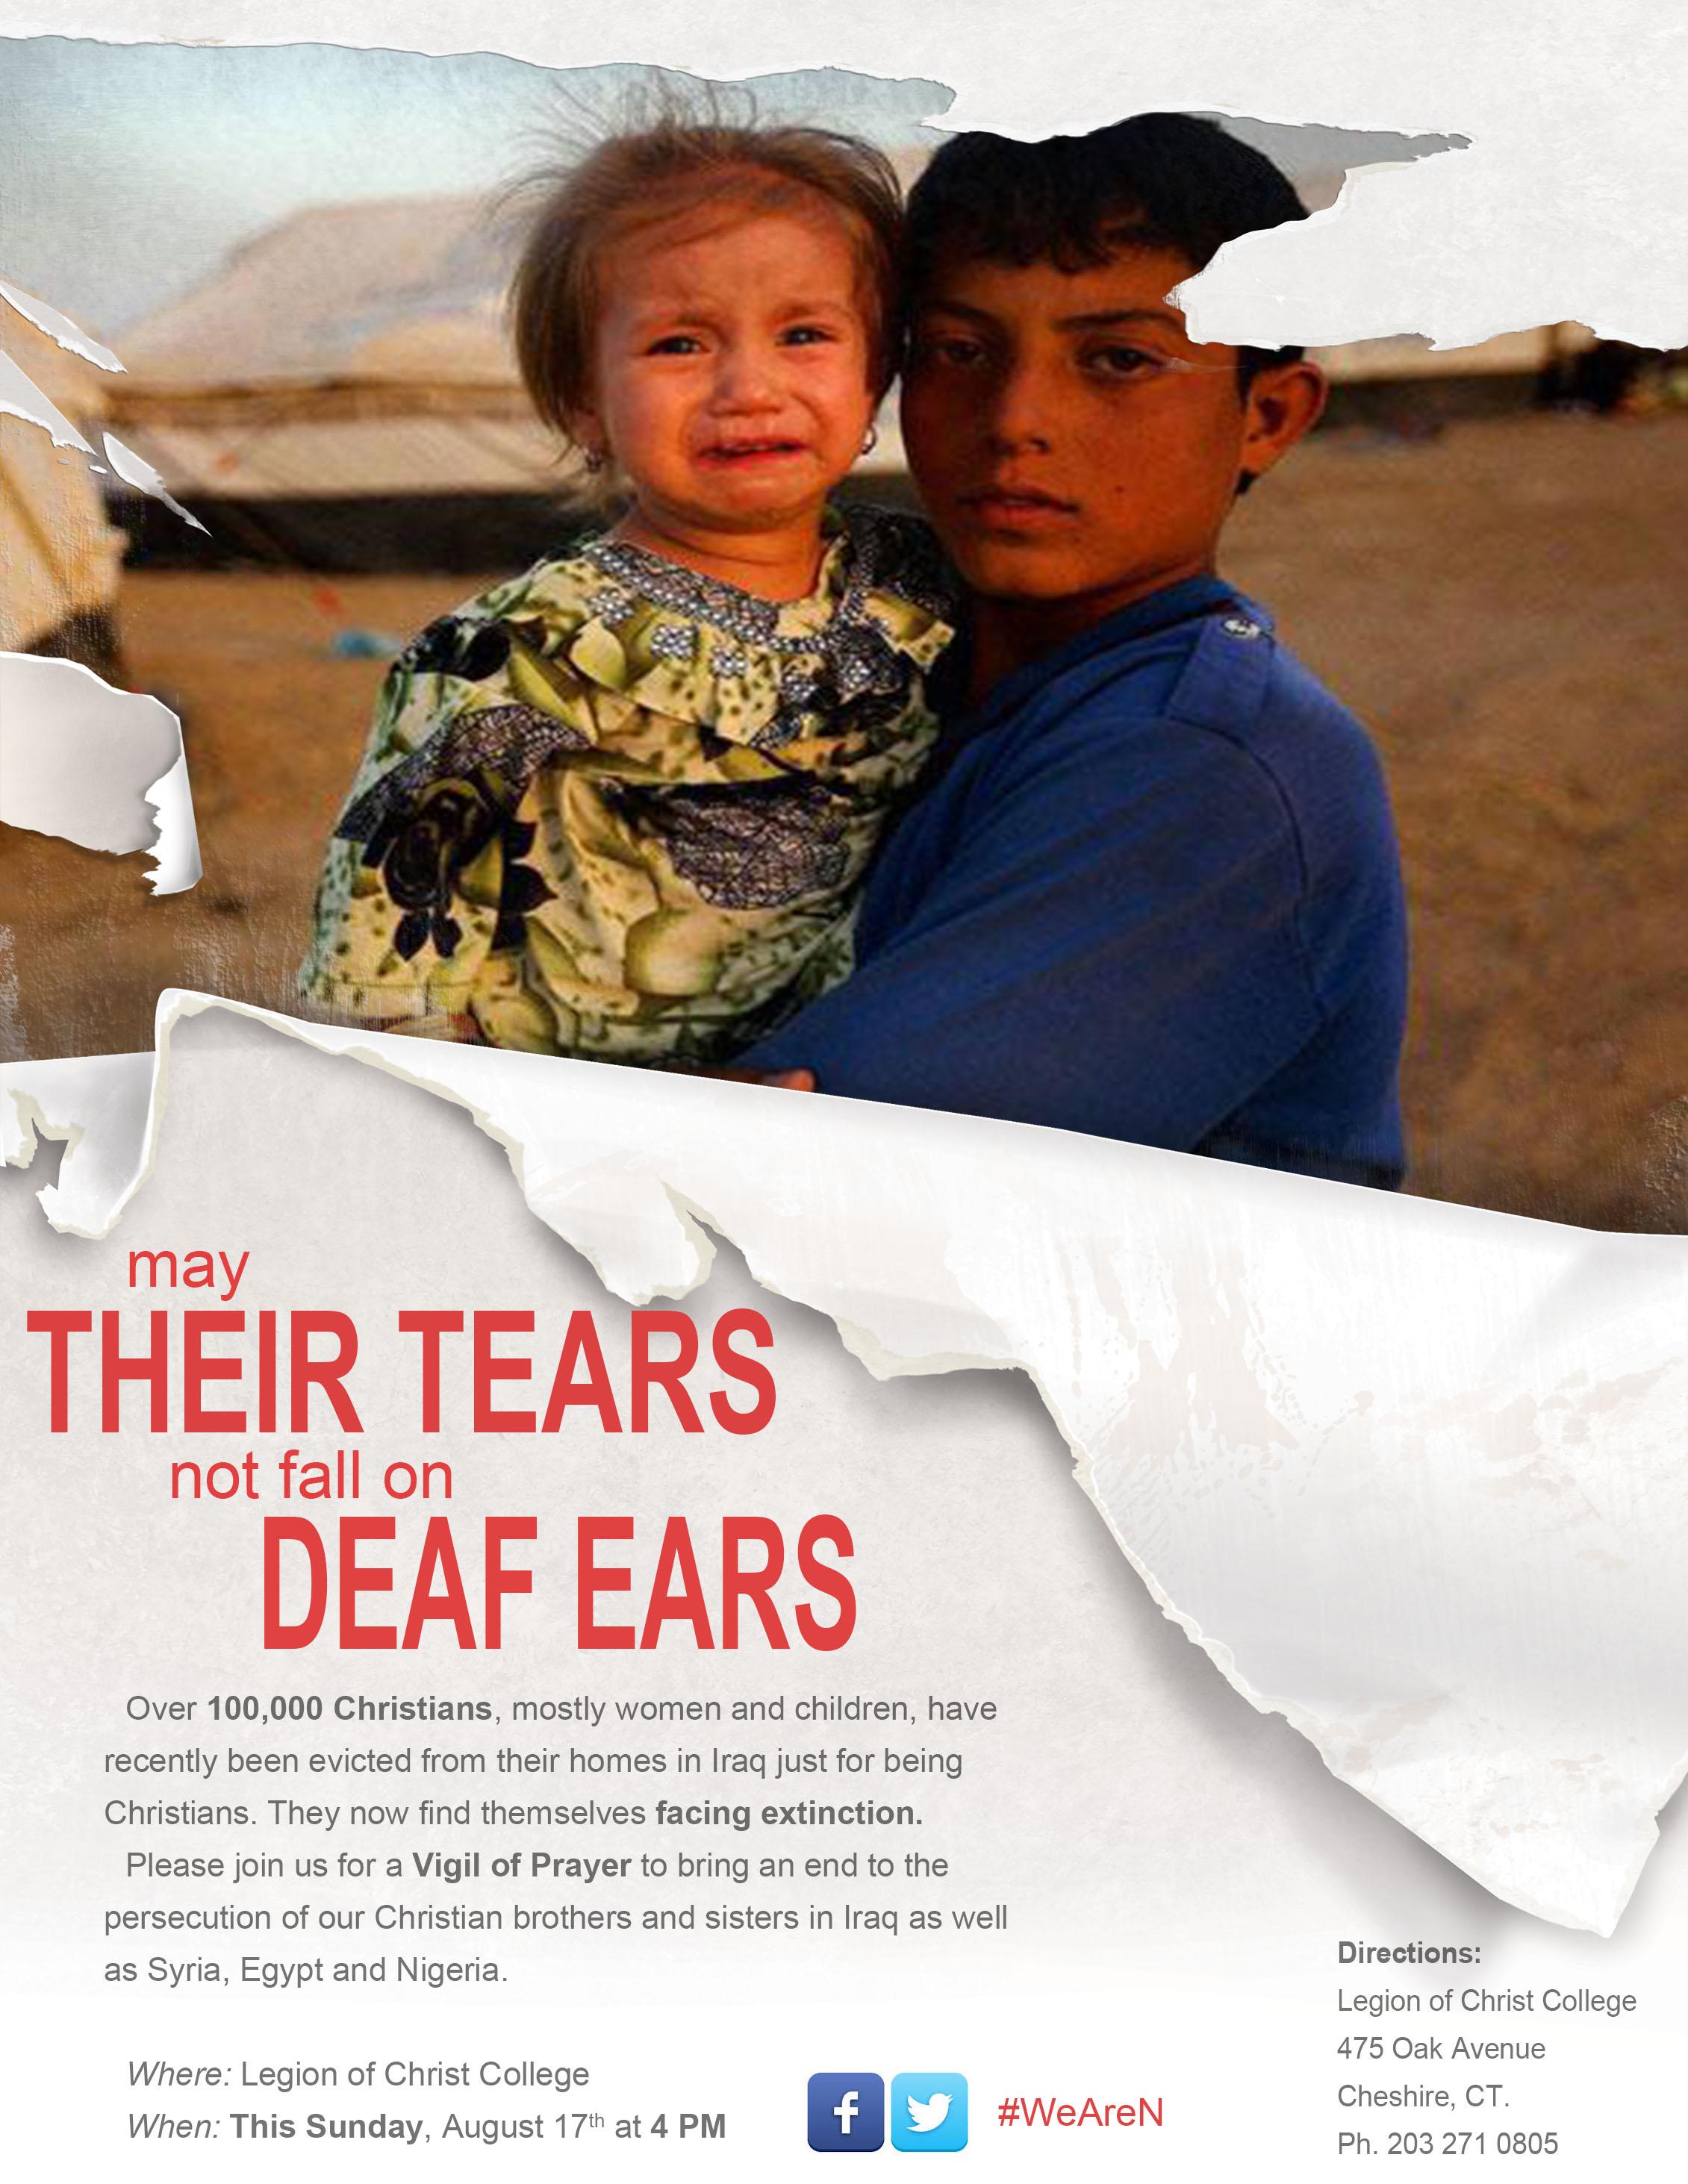 Poster promoting prayer vigil for Iraqi Christians.